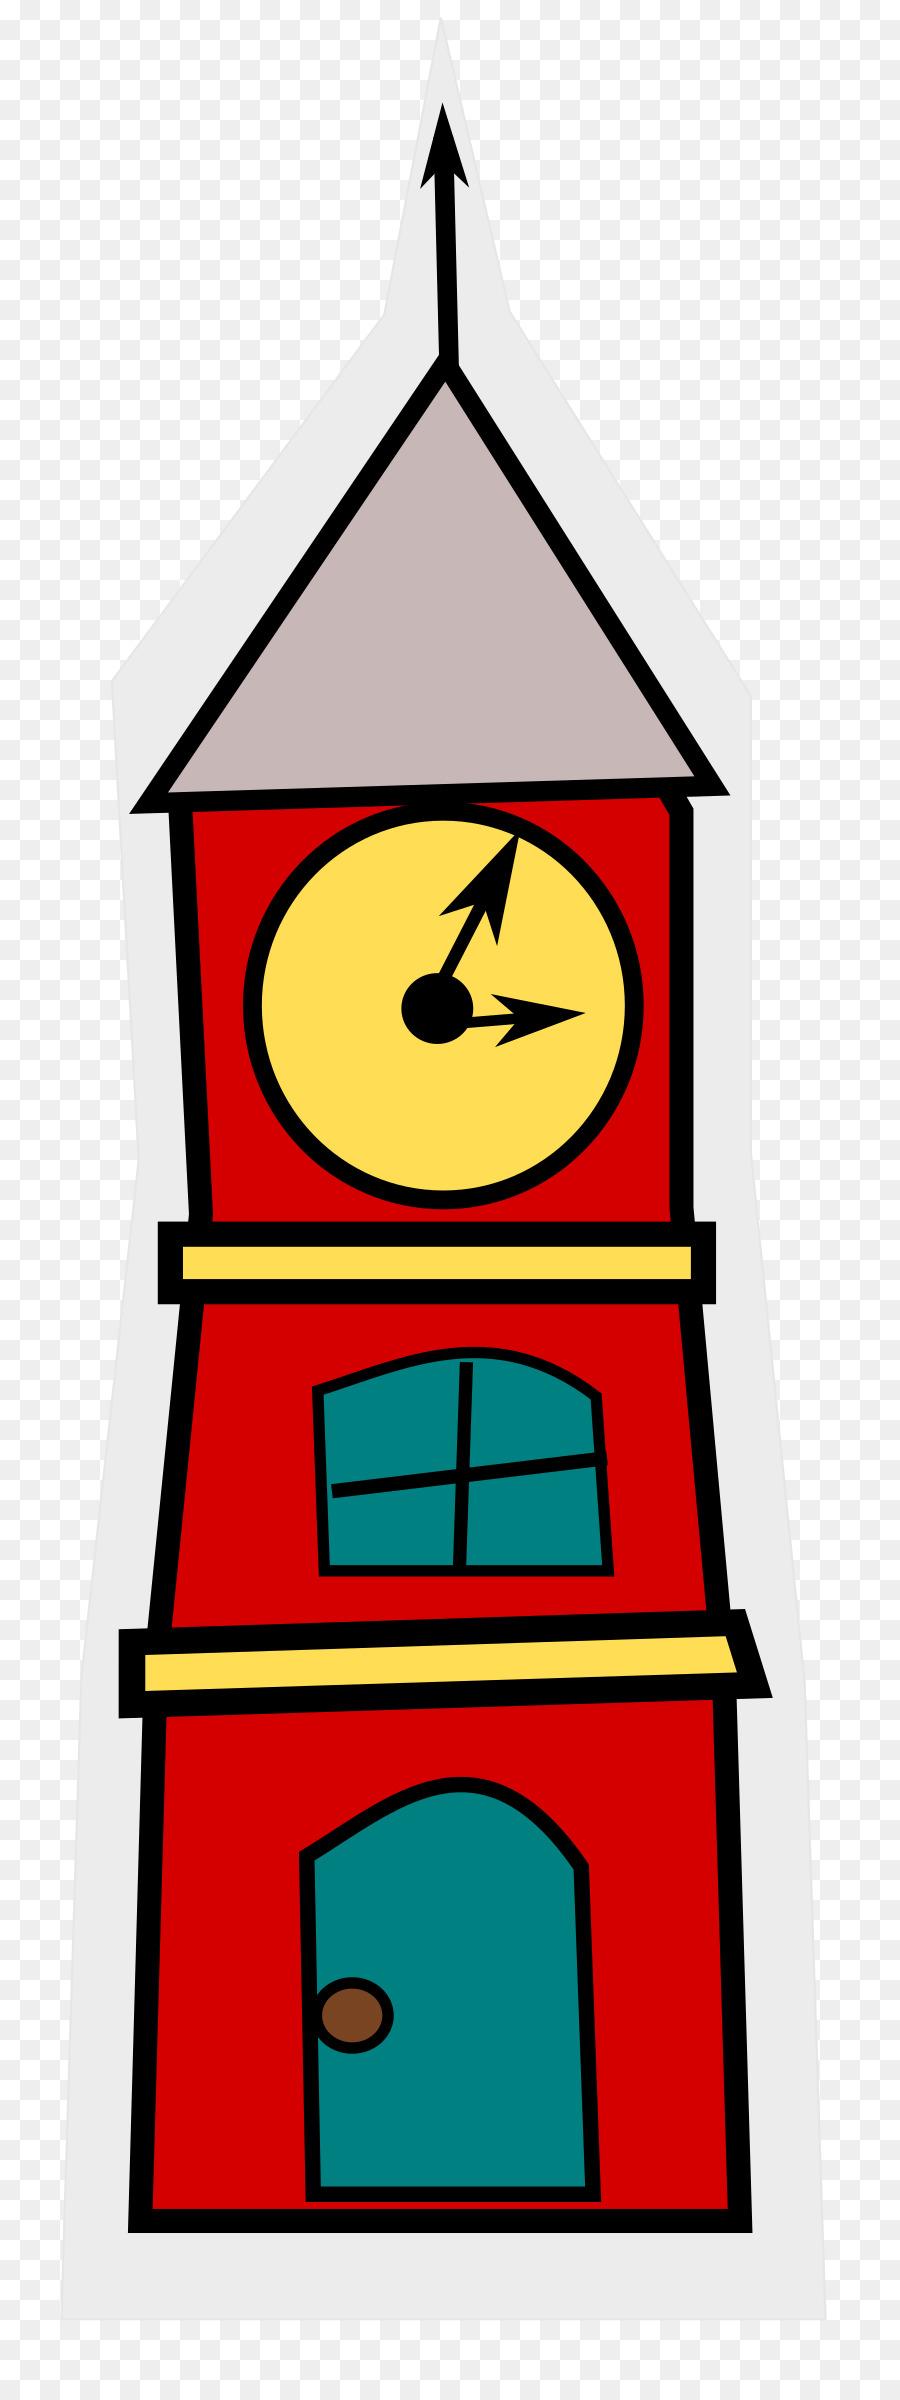 900x2400 Big Ben Kuala Lumpur Tower Clock Tower Cartoon